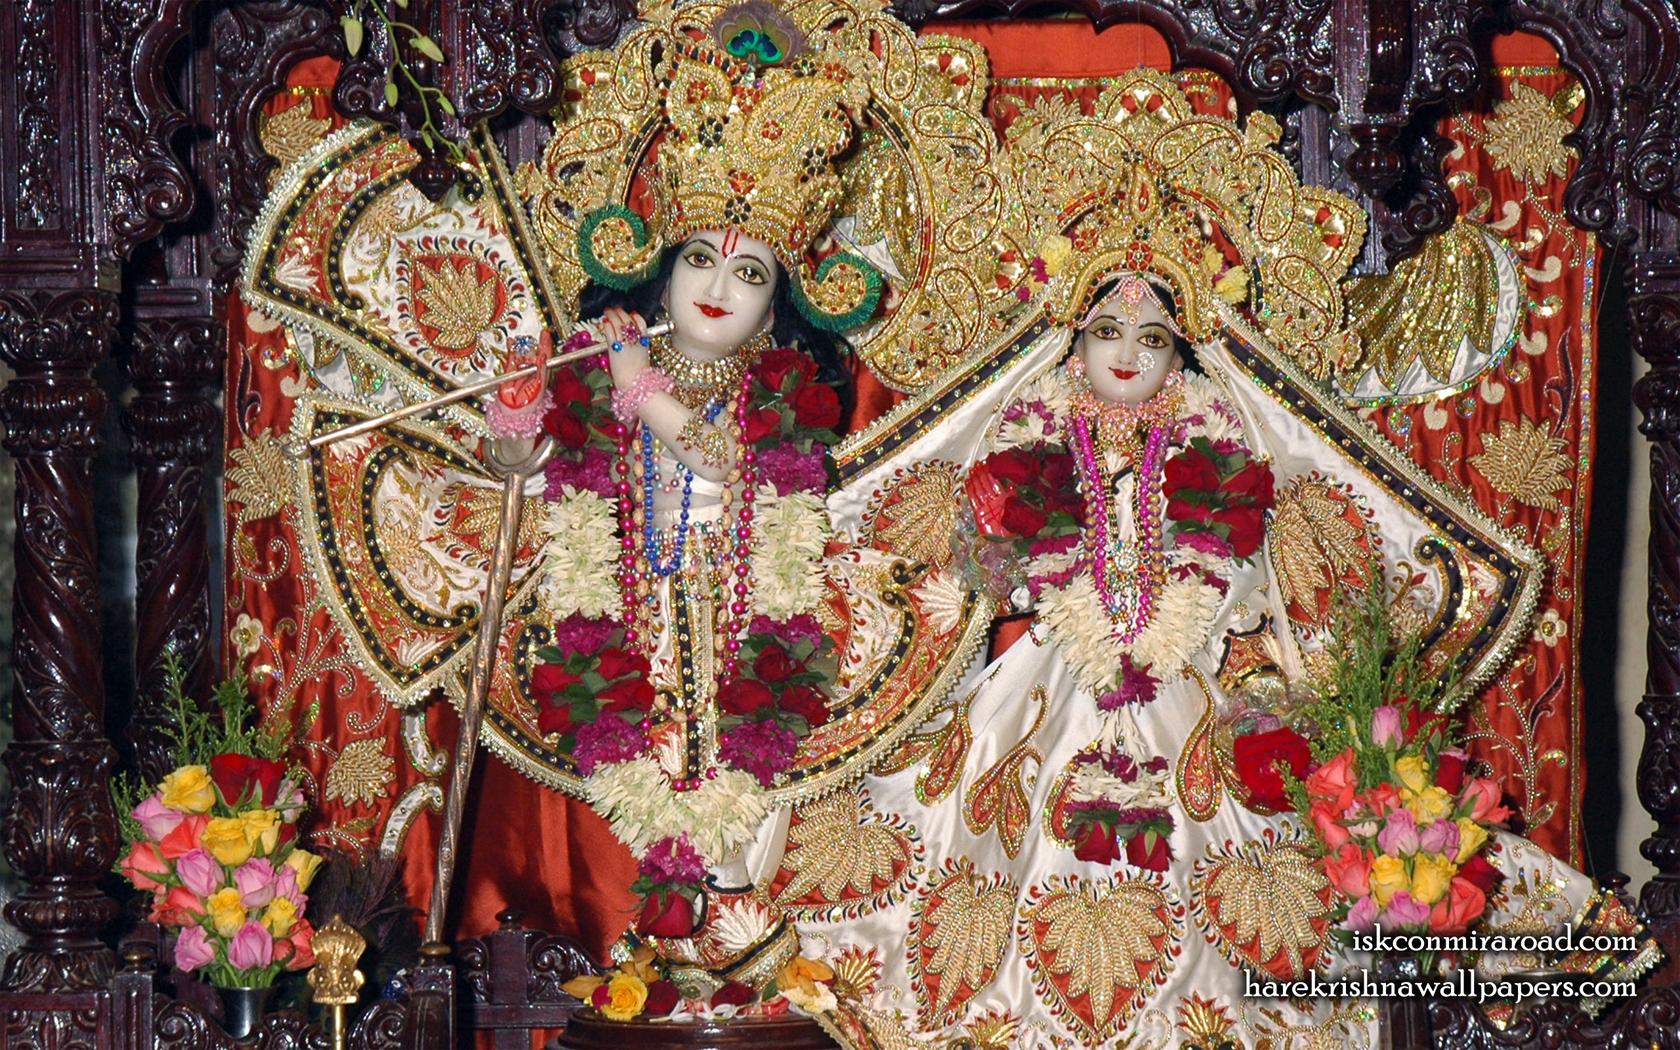 Sri Sri Radha Giridhari Wallpaper (015) Size 1680x1050 Download